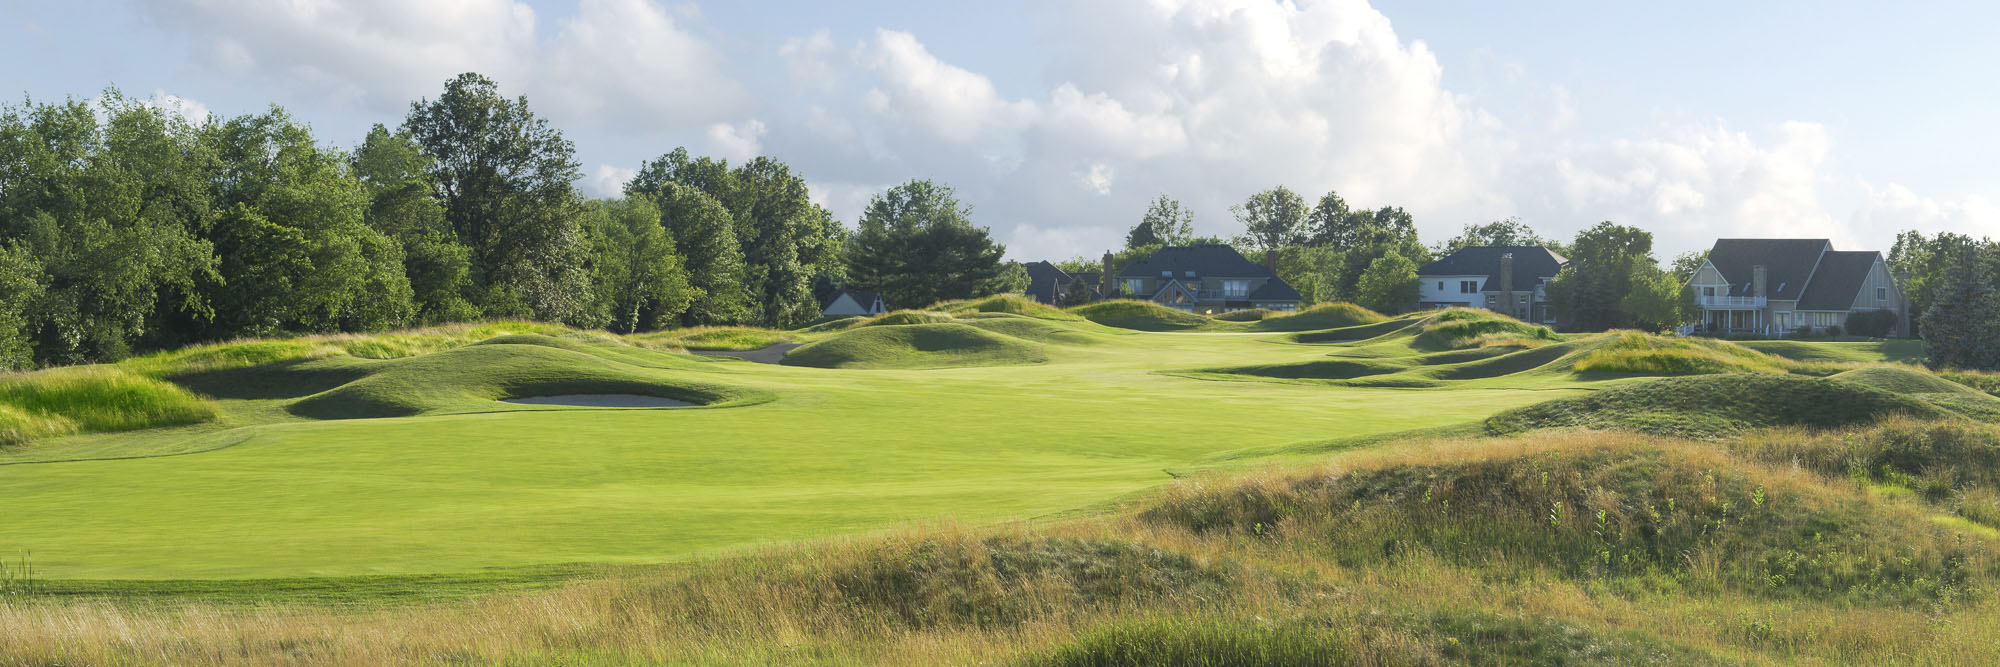 Golf Course Image - Jefferson Country Club No. 5